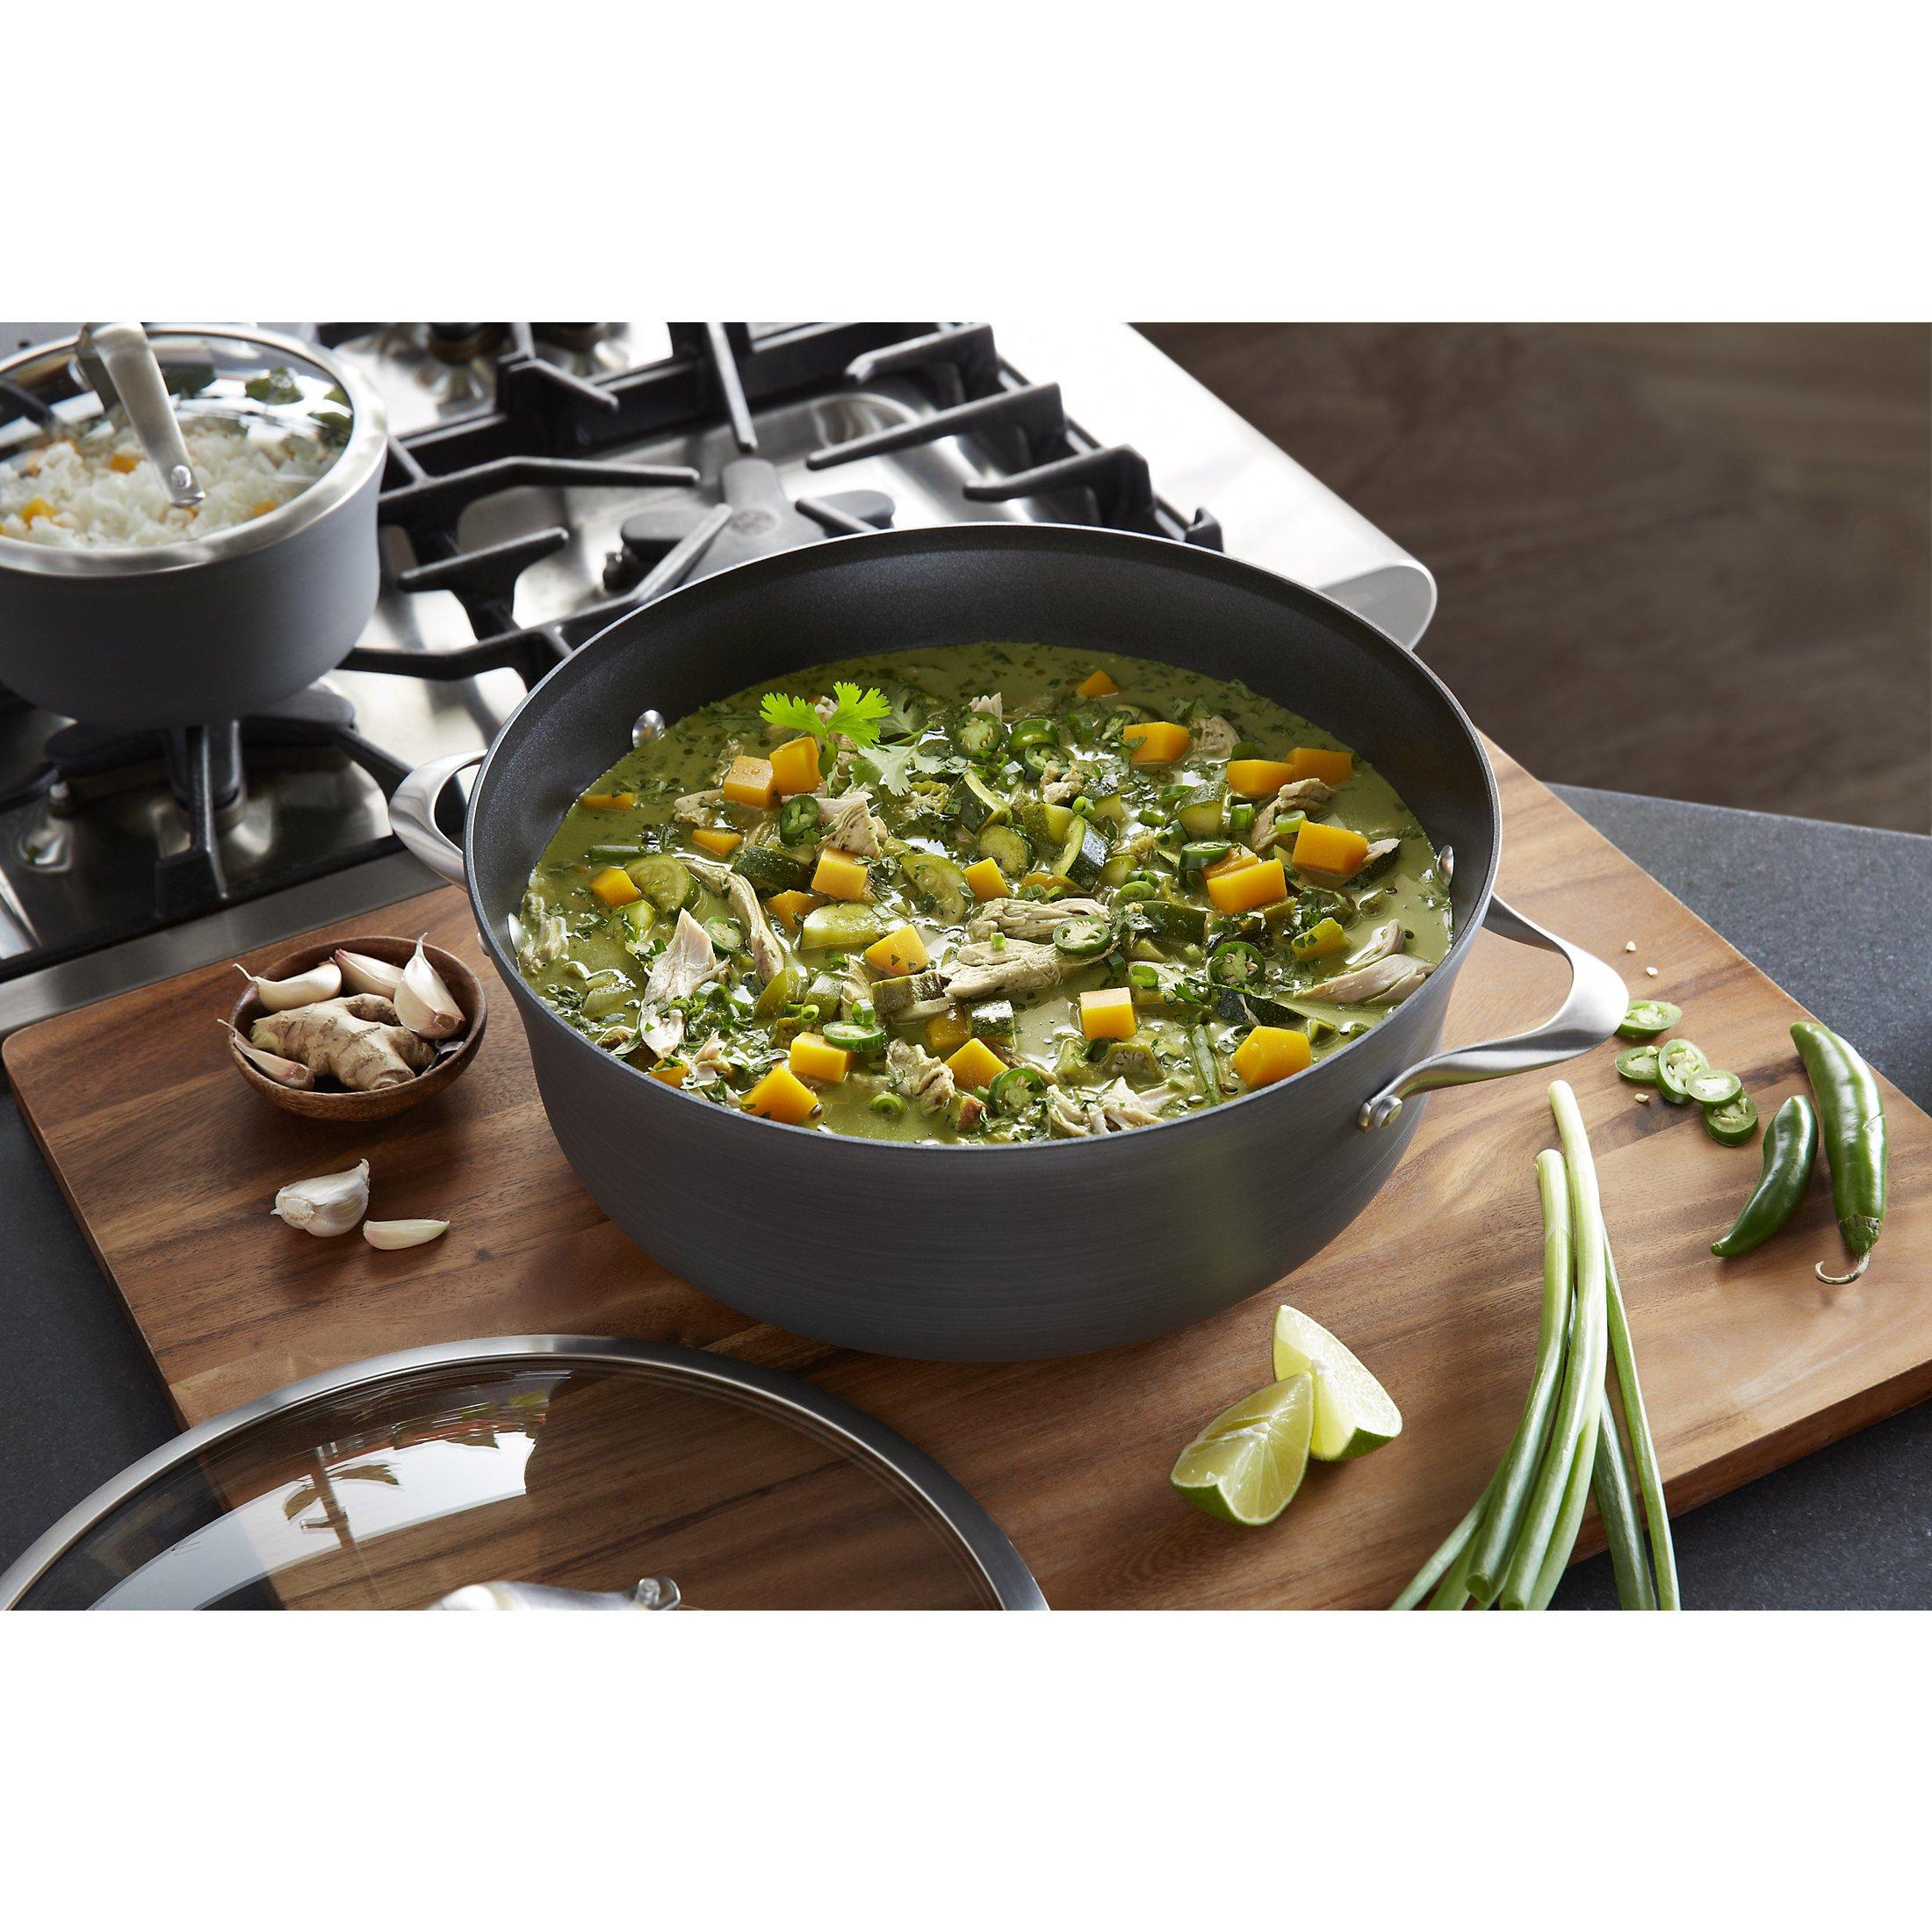 Calphalon Pc Commercial Nonstick Hard Anodized Kitchen Cookware Set